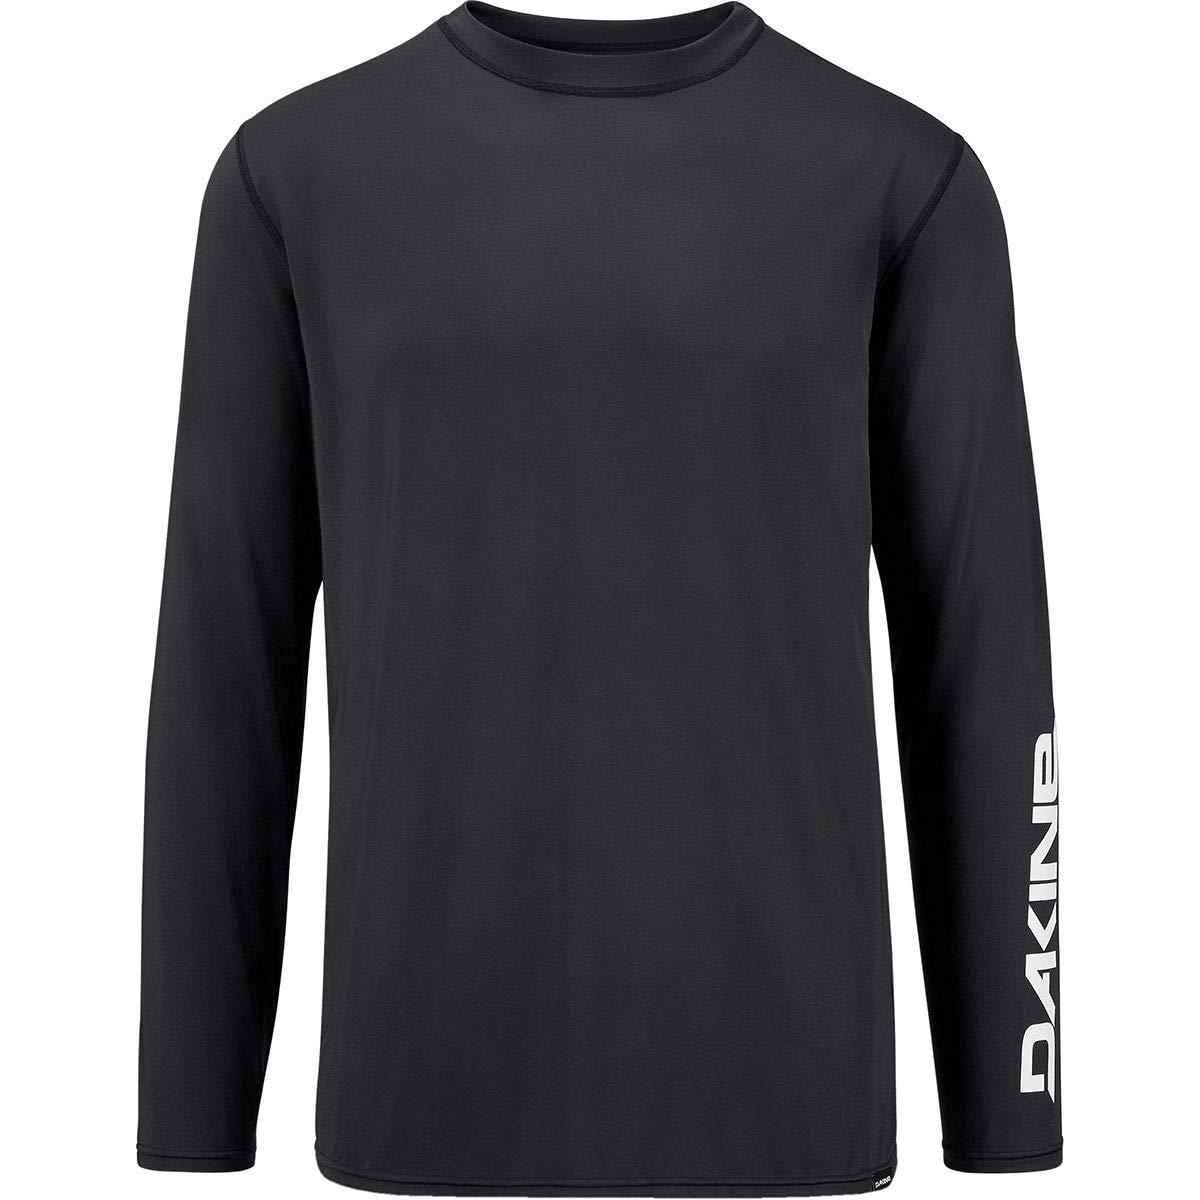 Dakine Mens Heavy Duty Loose Fit Long Sleeve Surf Shirt Black 10002278 Size L